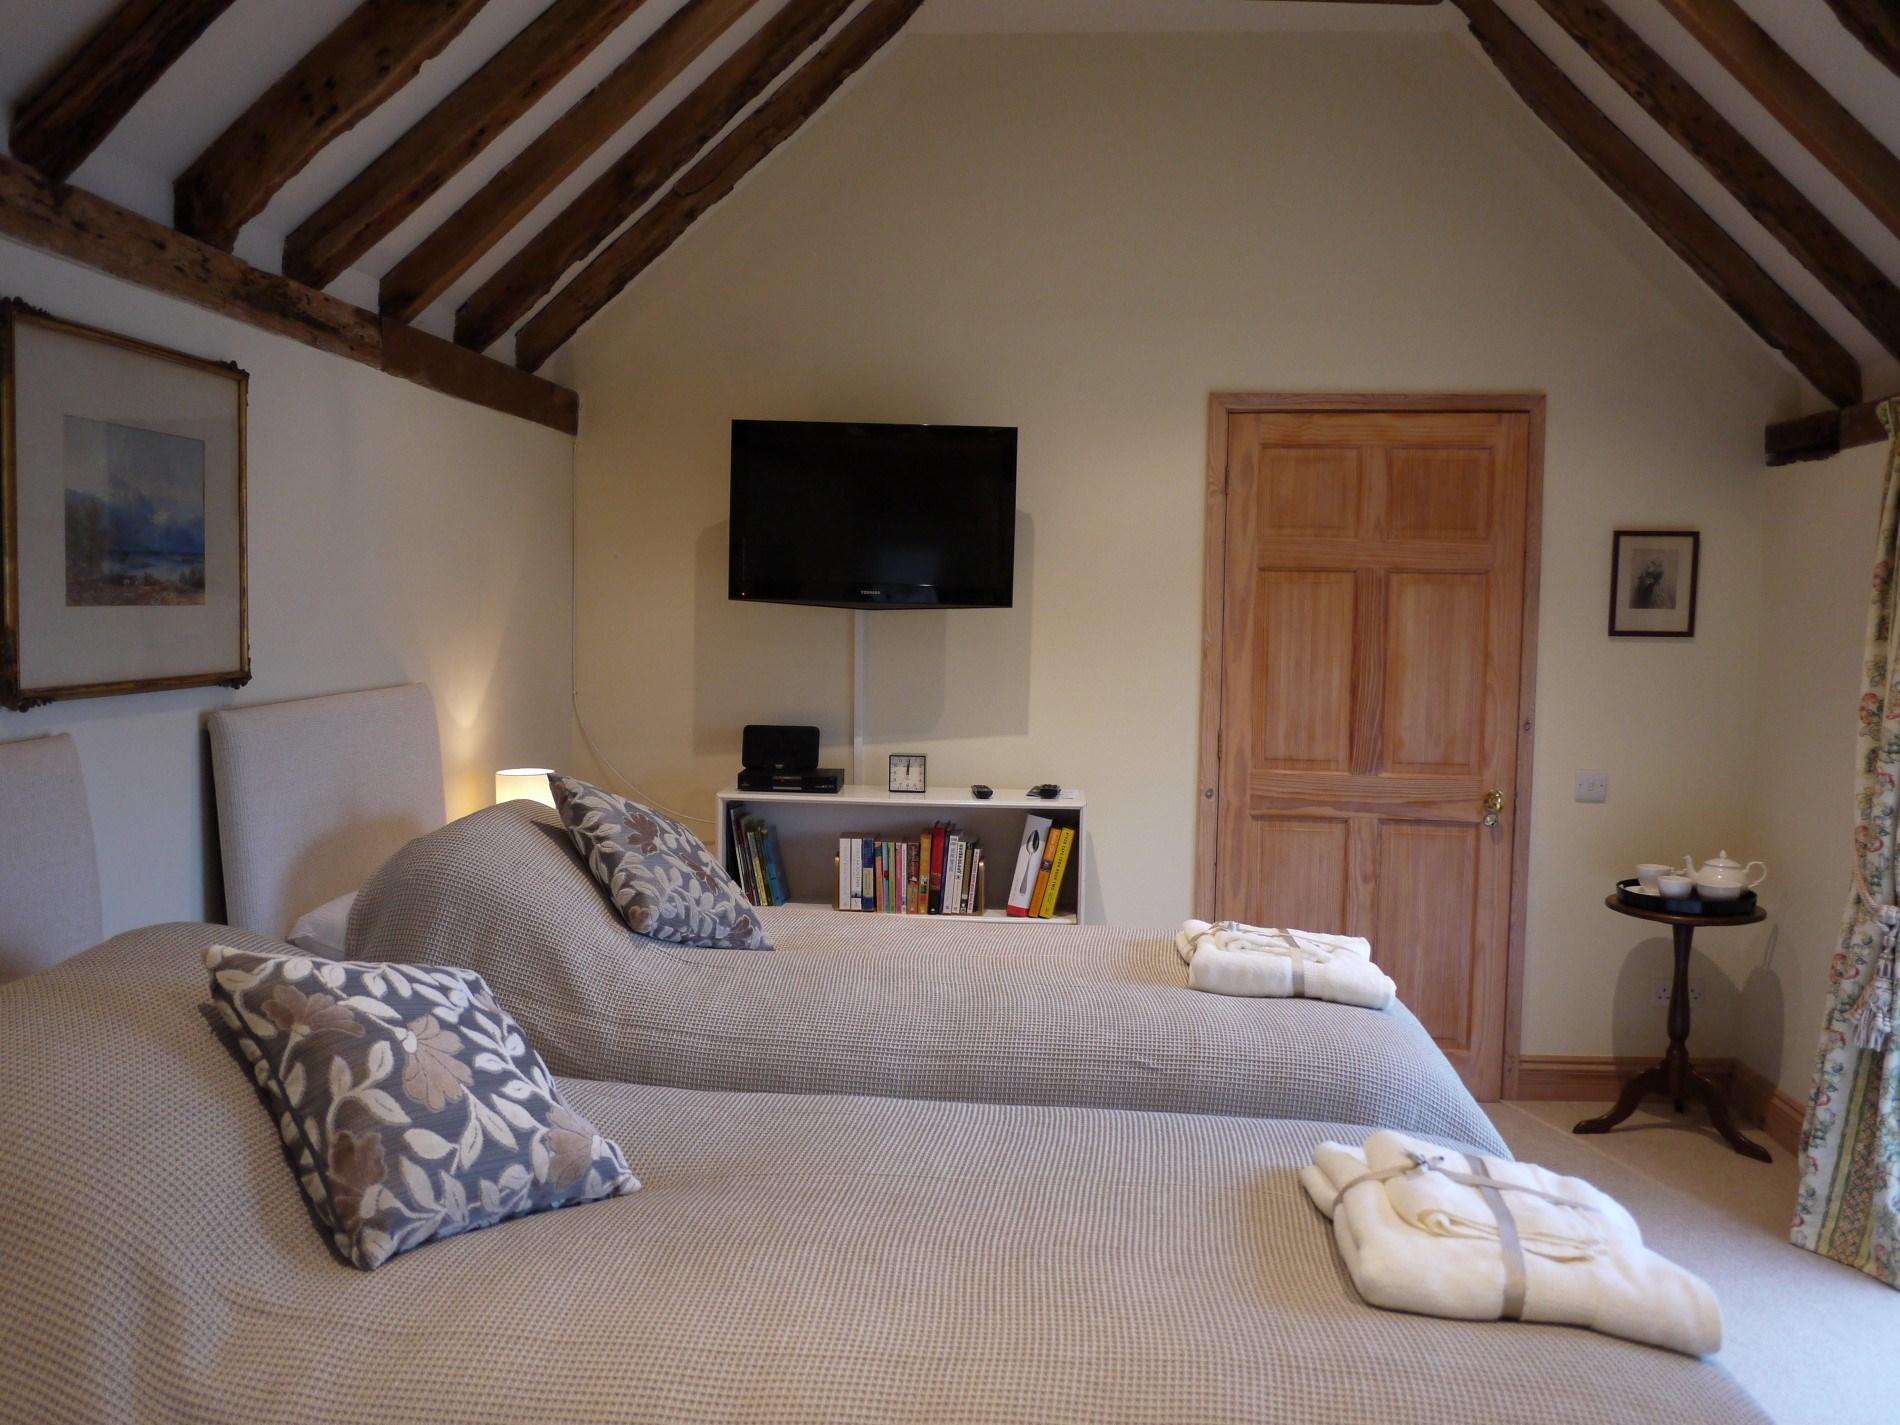 32 inch TV located in bedroom